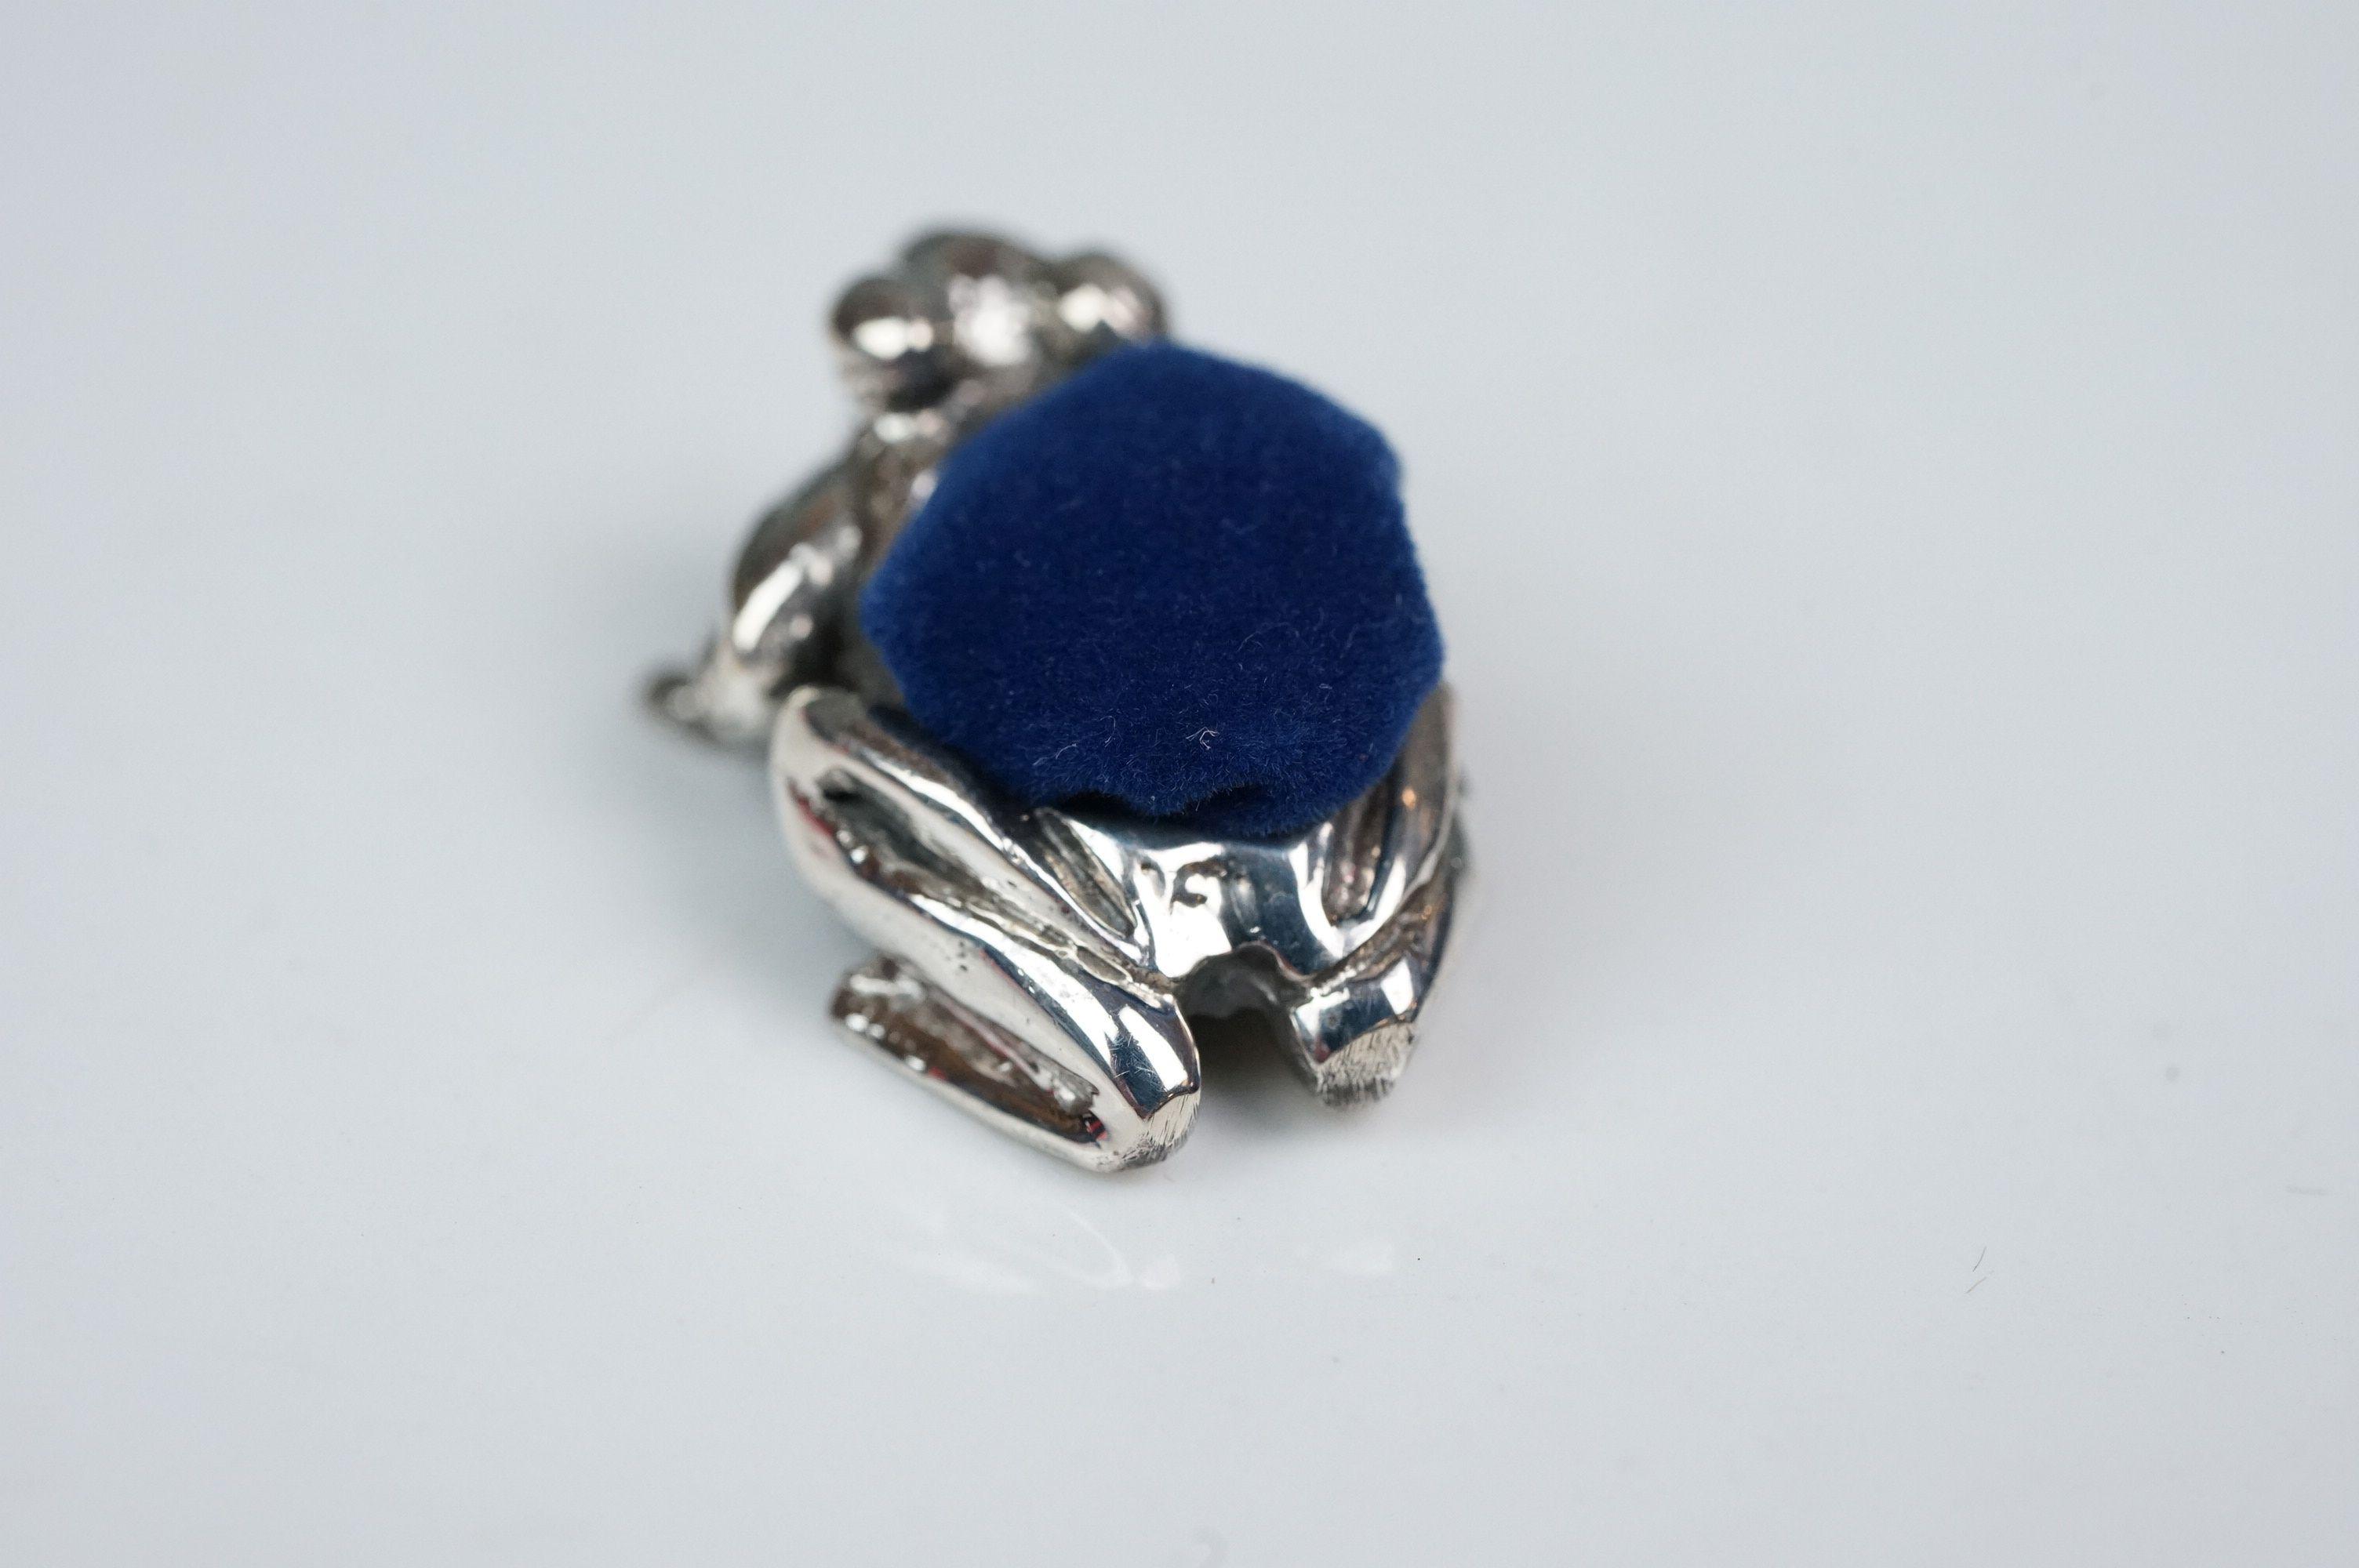 Silver frog pincushion - Image 2 of 4